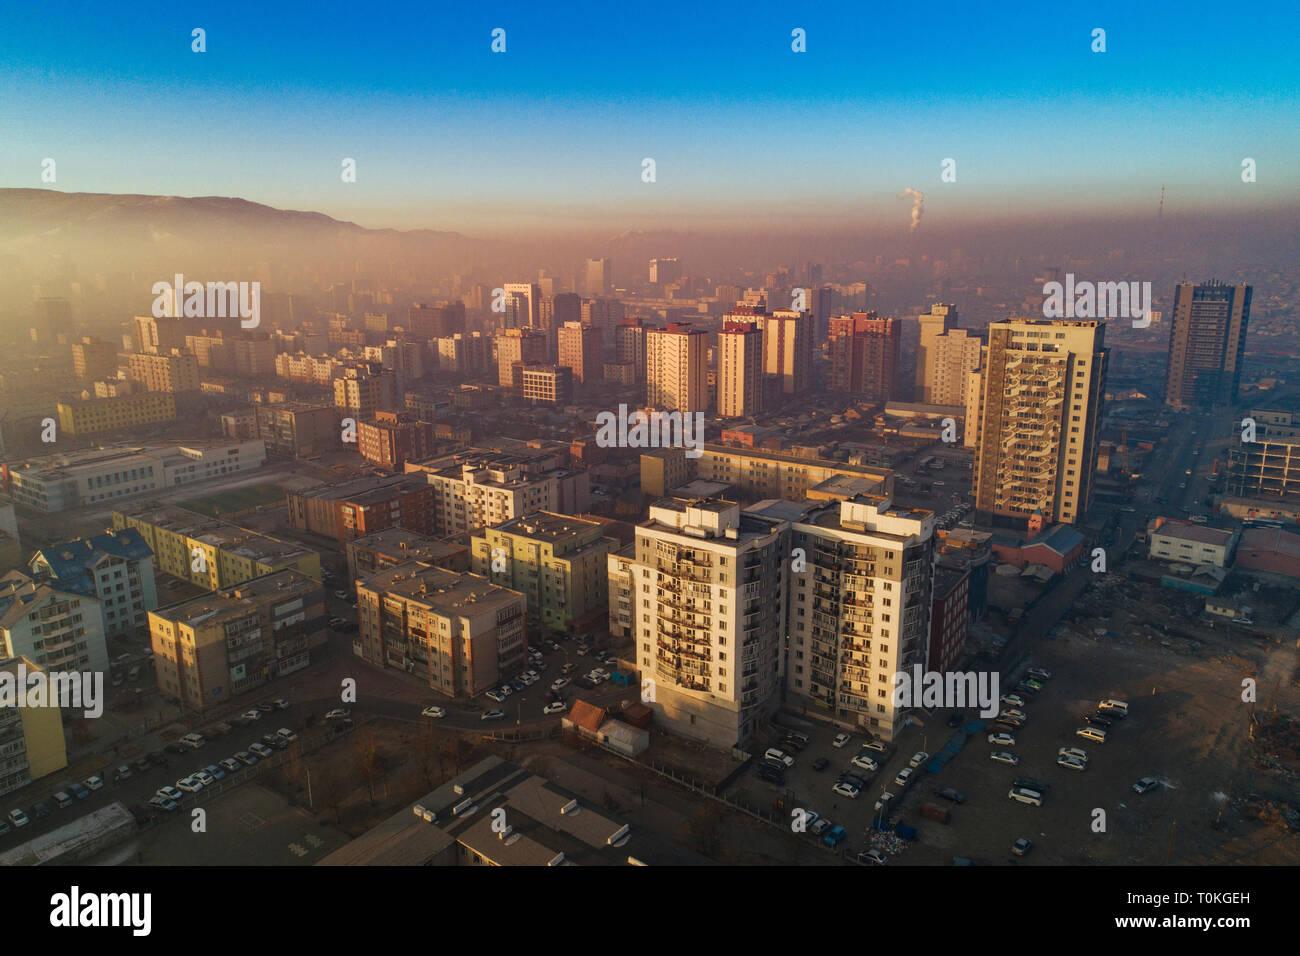 Ulaanbaatar at sunrise with smog, Mongolia Stock Photo